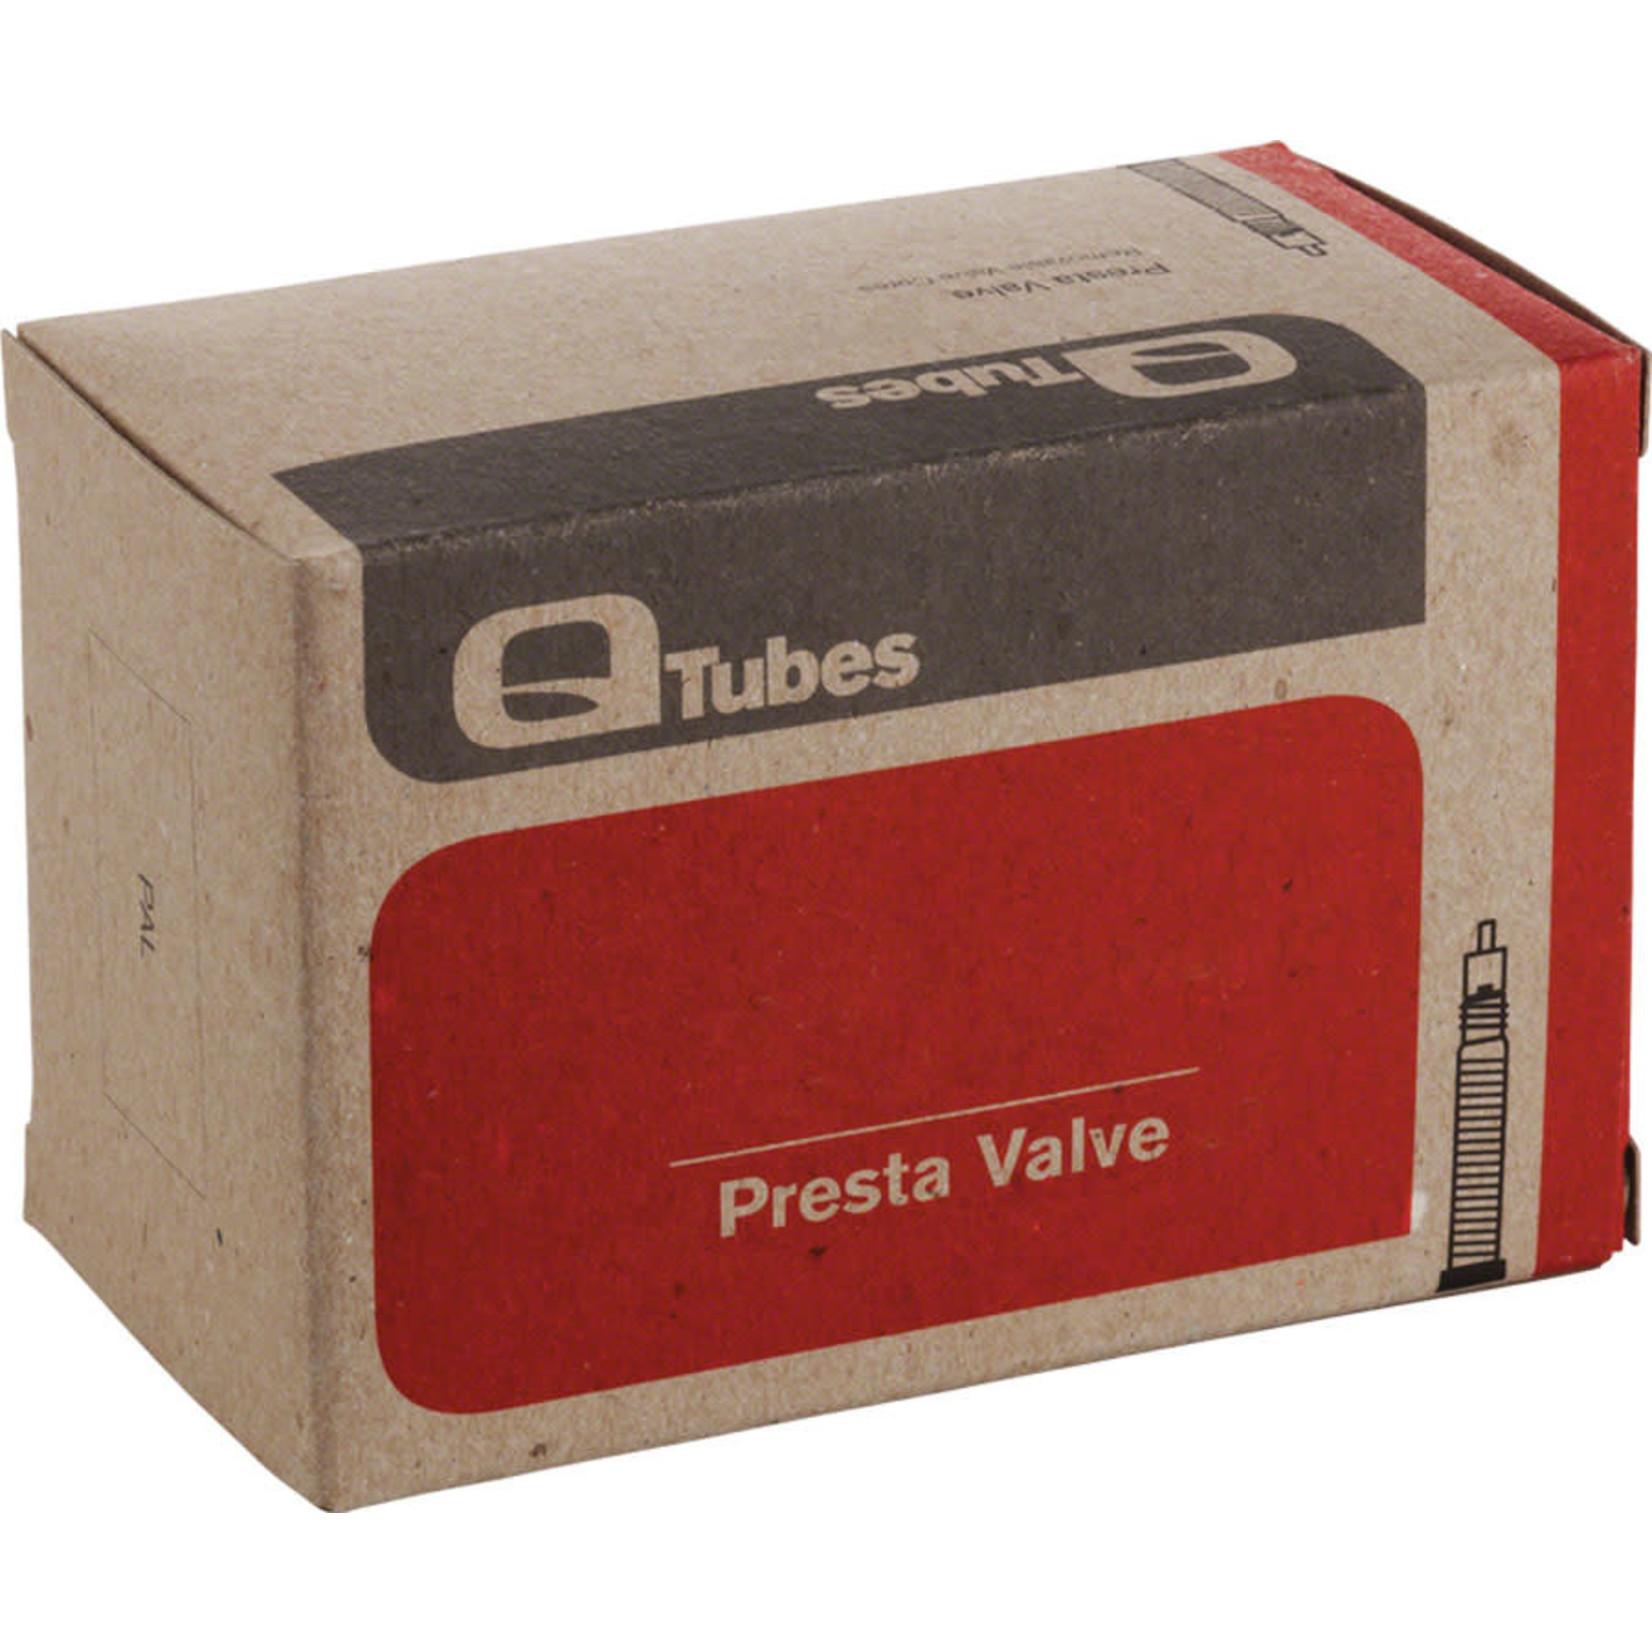 Q-Tubes Q-Tubes 650c x 18-23mm 48mm Presta Valve Tube 89g